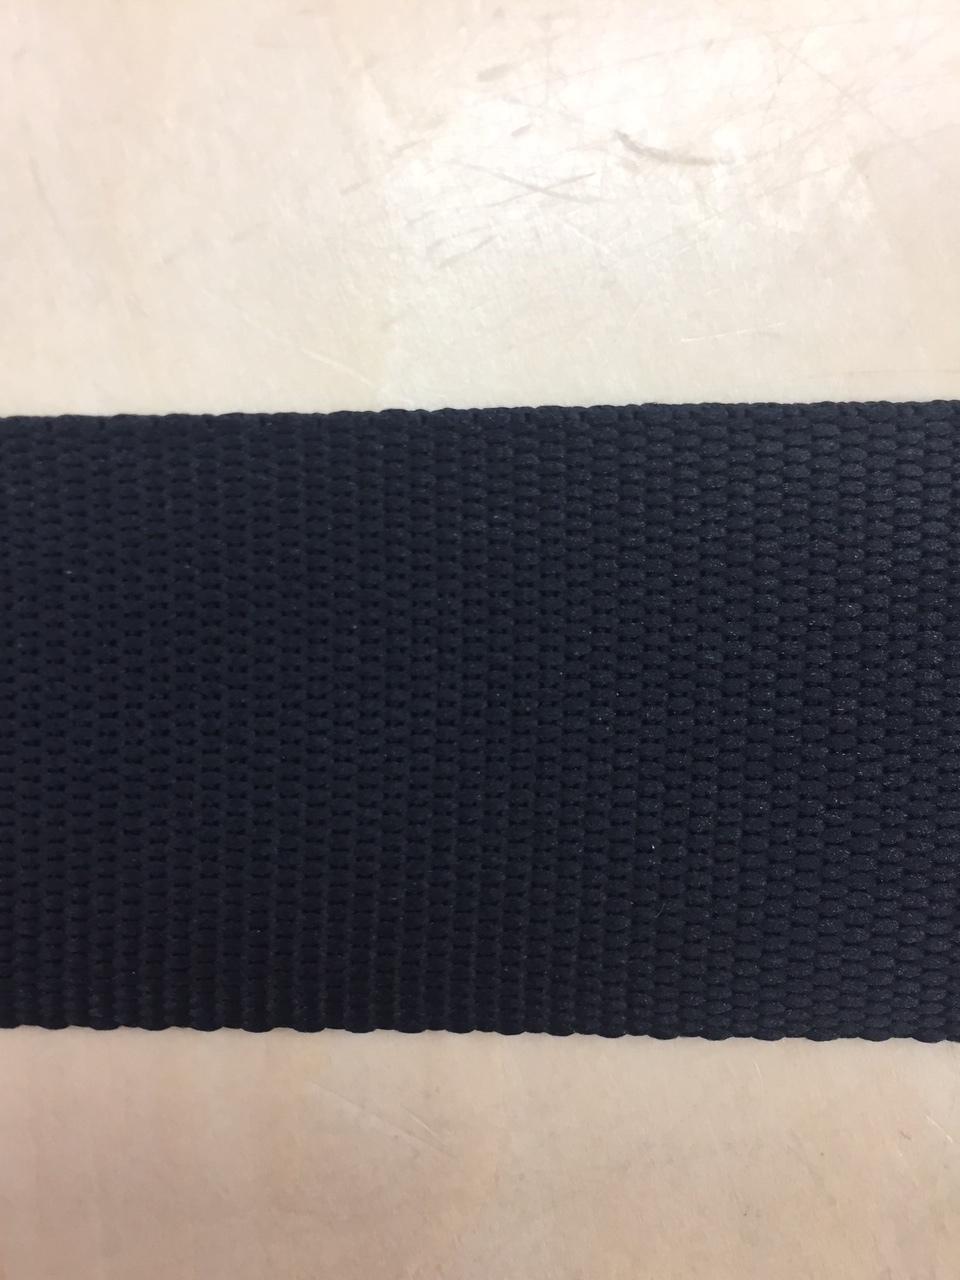 YKK ポリエステル テープ TH15-50 50㎜幅 1.5mm厚 黒 5m単位